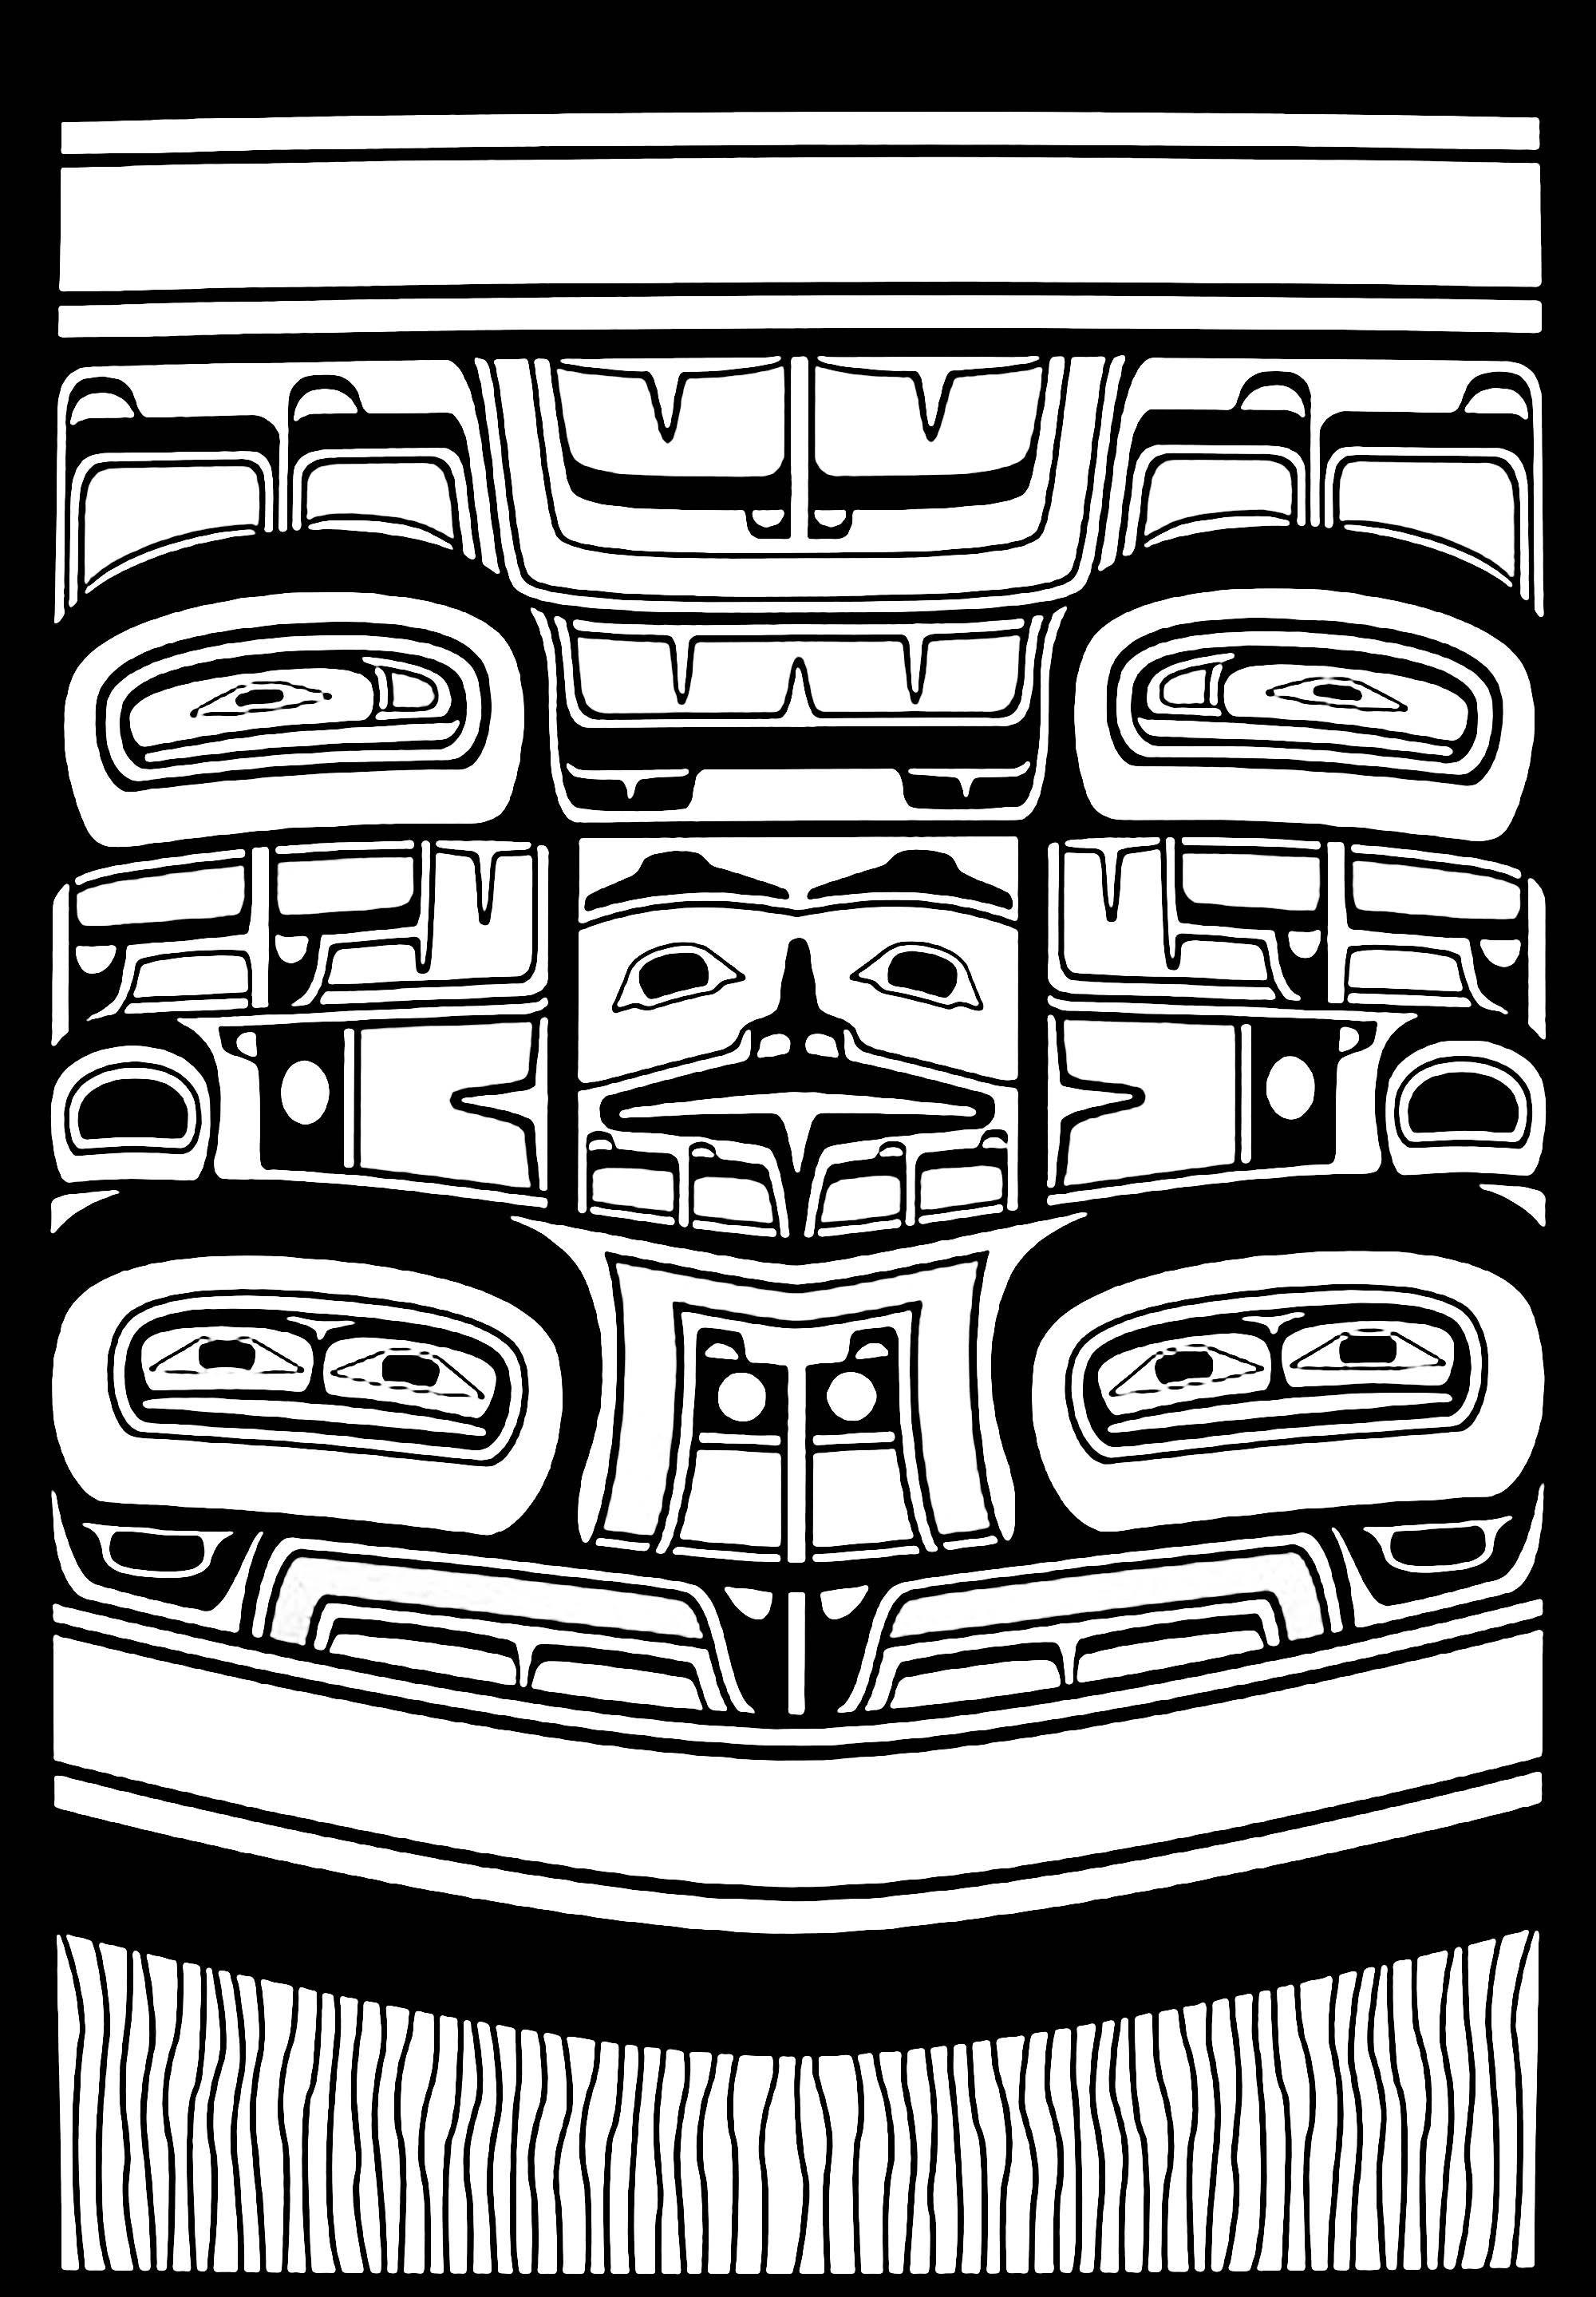 Pin de JustColor.net | Adult coloring pages en Native American Art ...